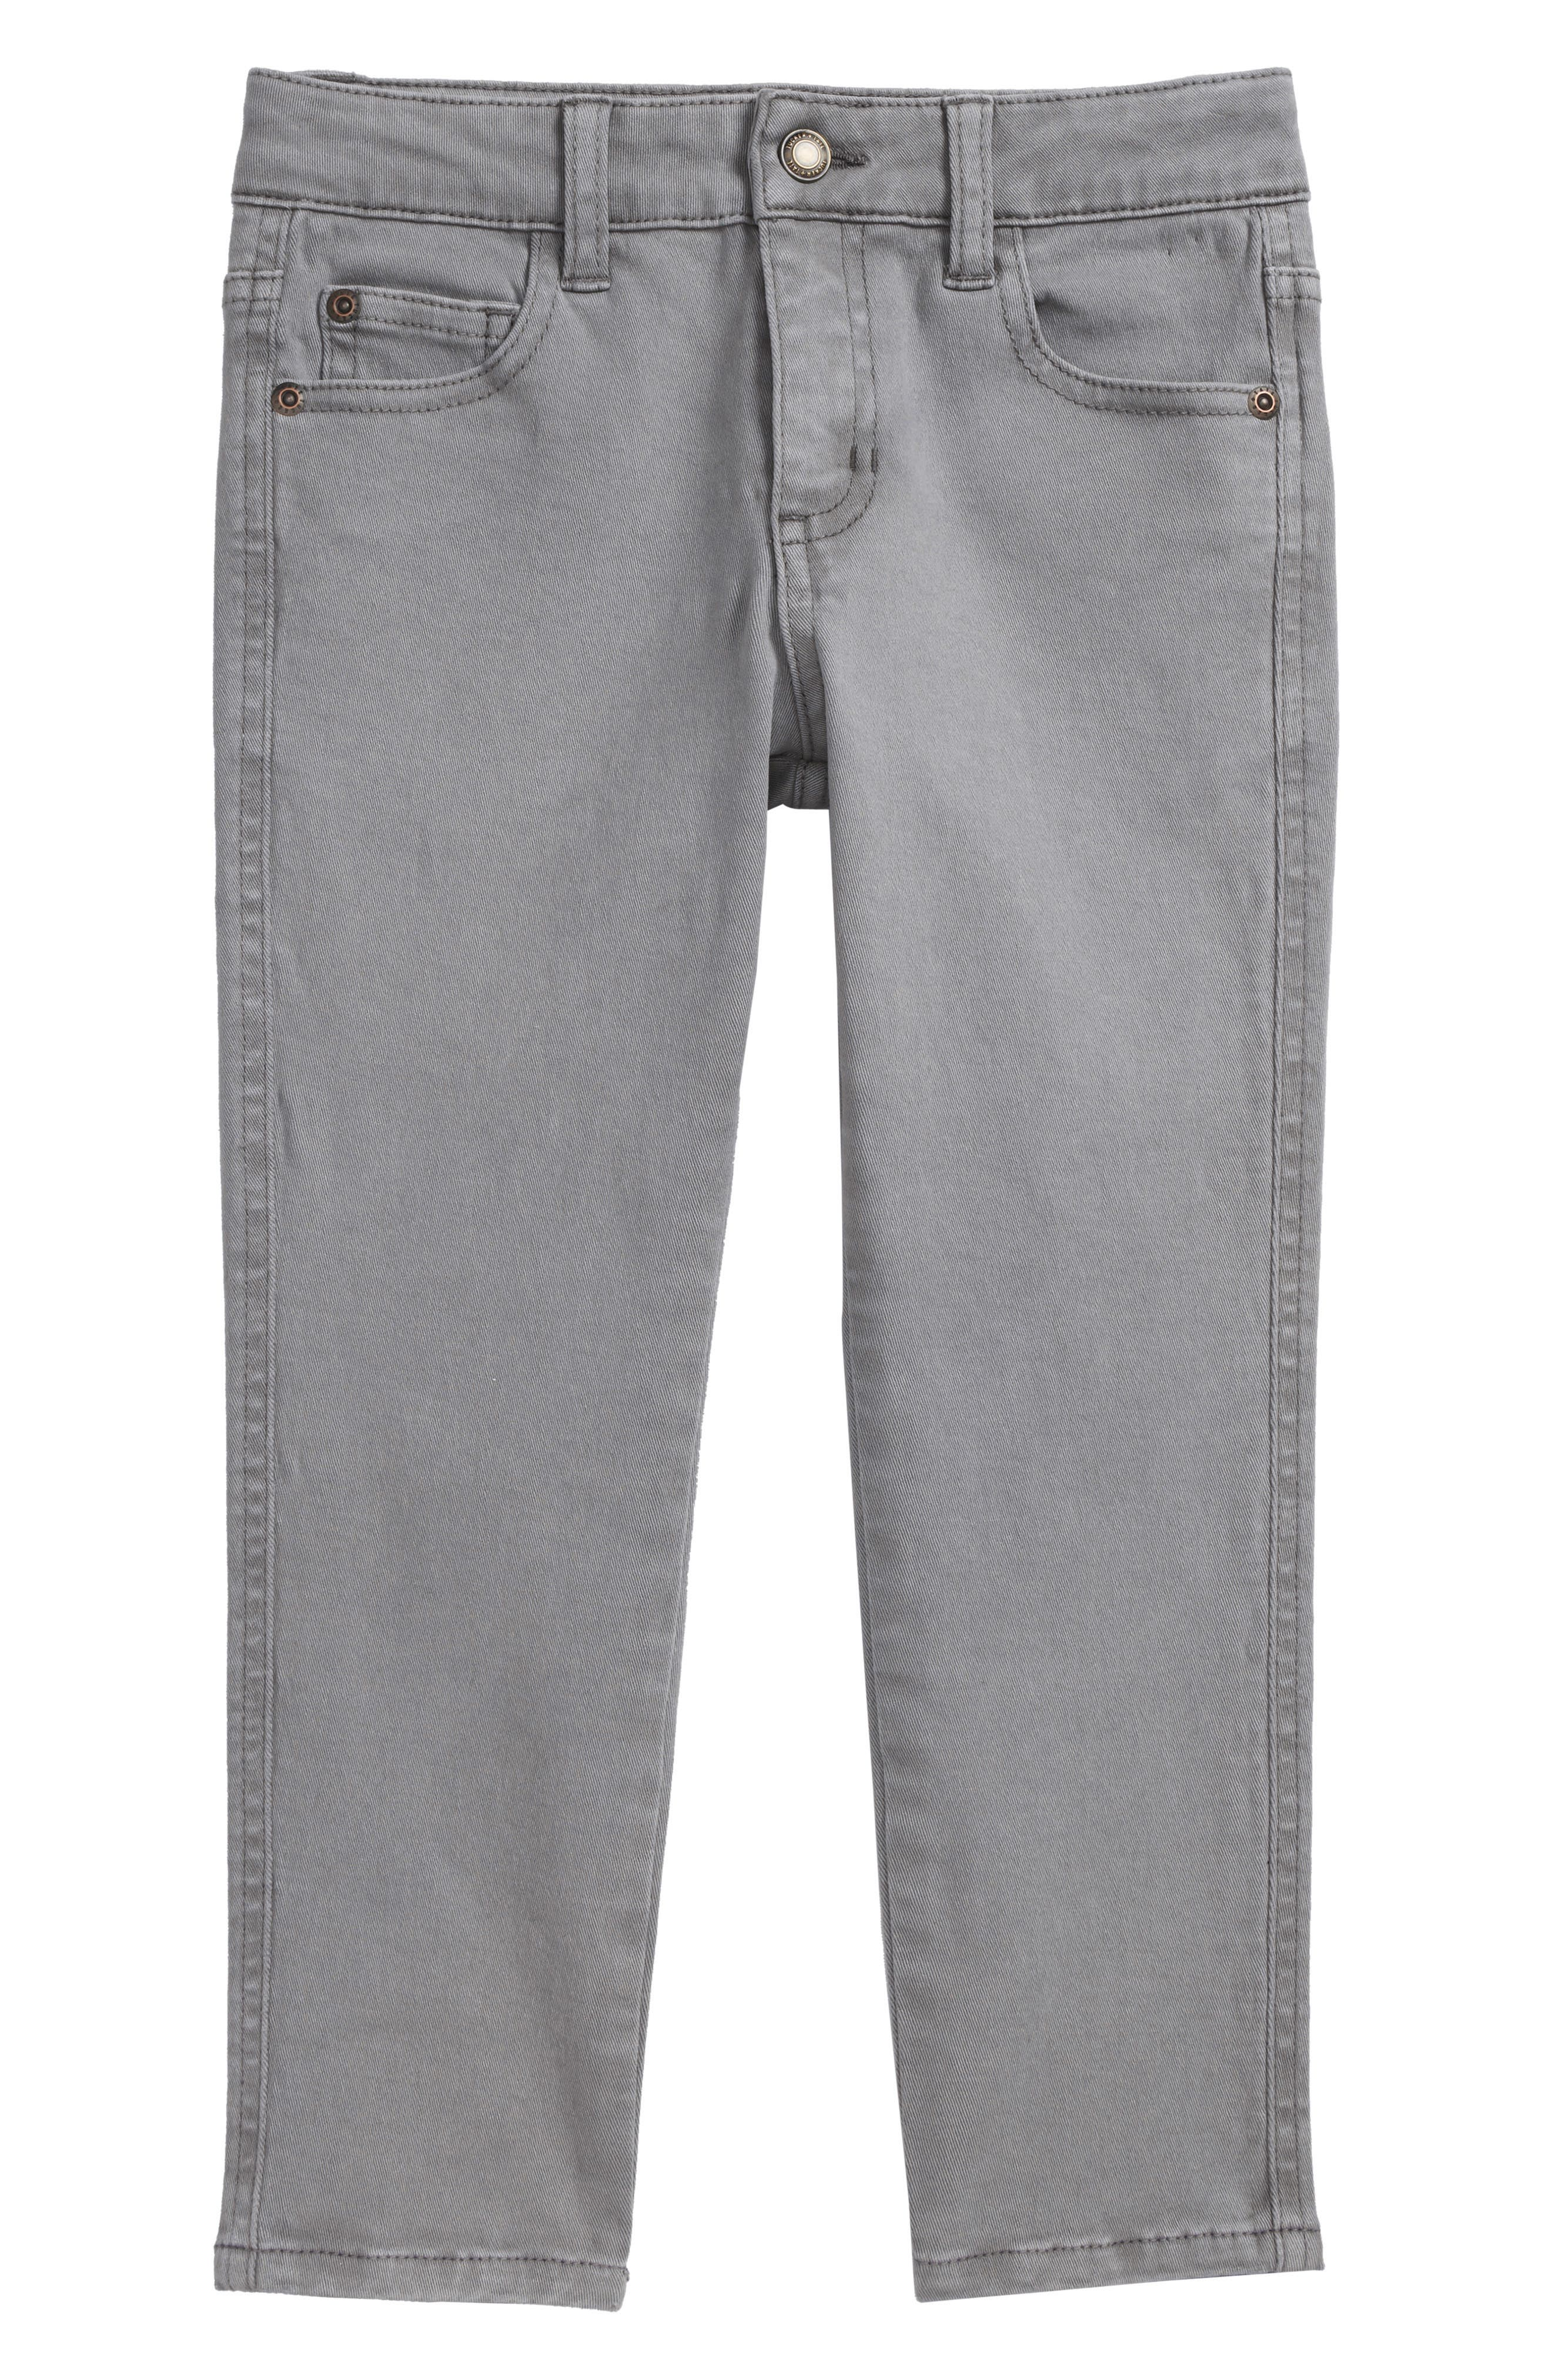 TUCKER + TATE, Stretch Chino Pants, Main thumbnail 1, color, 030